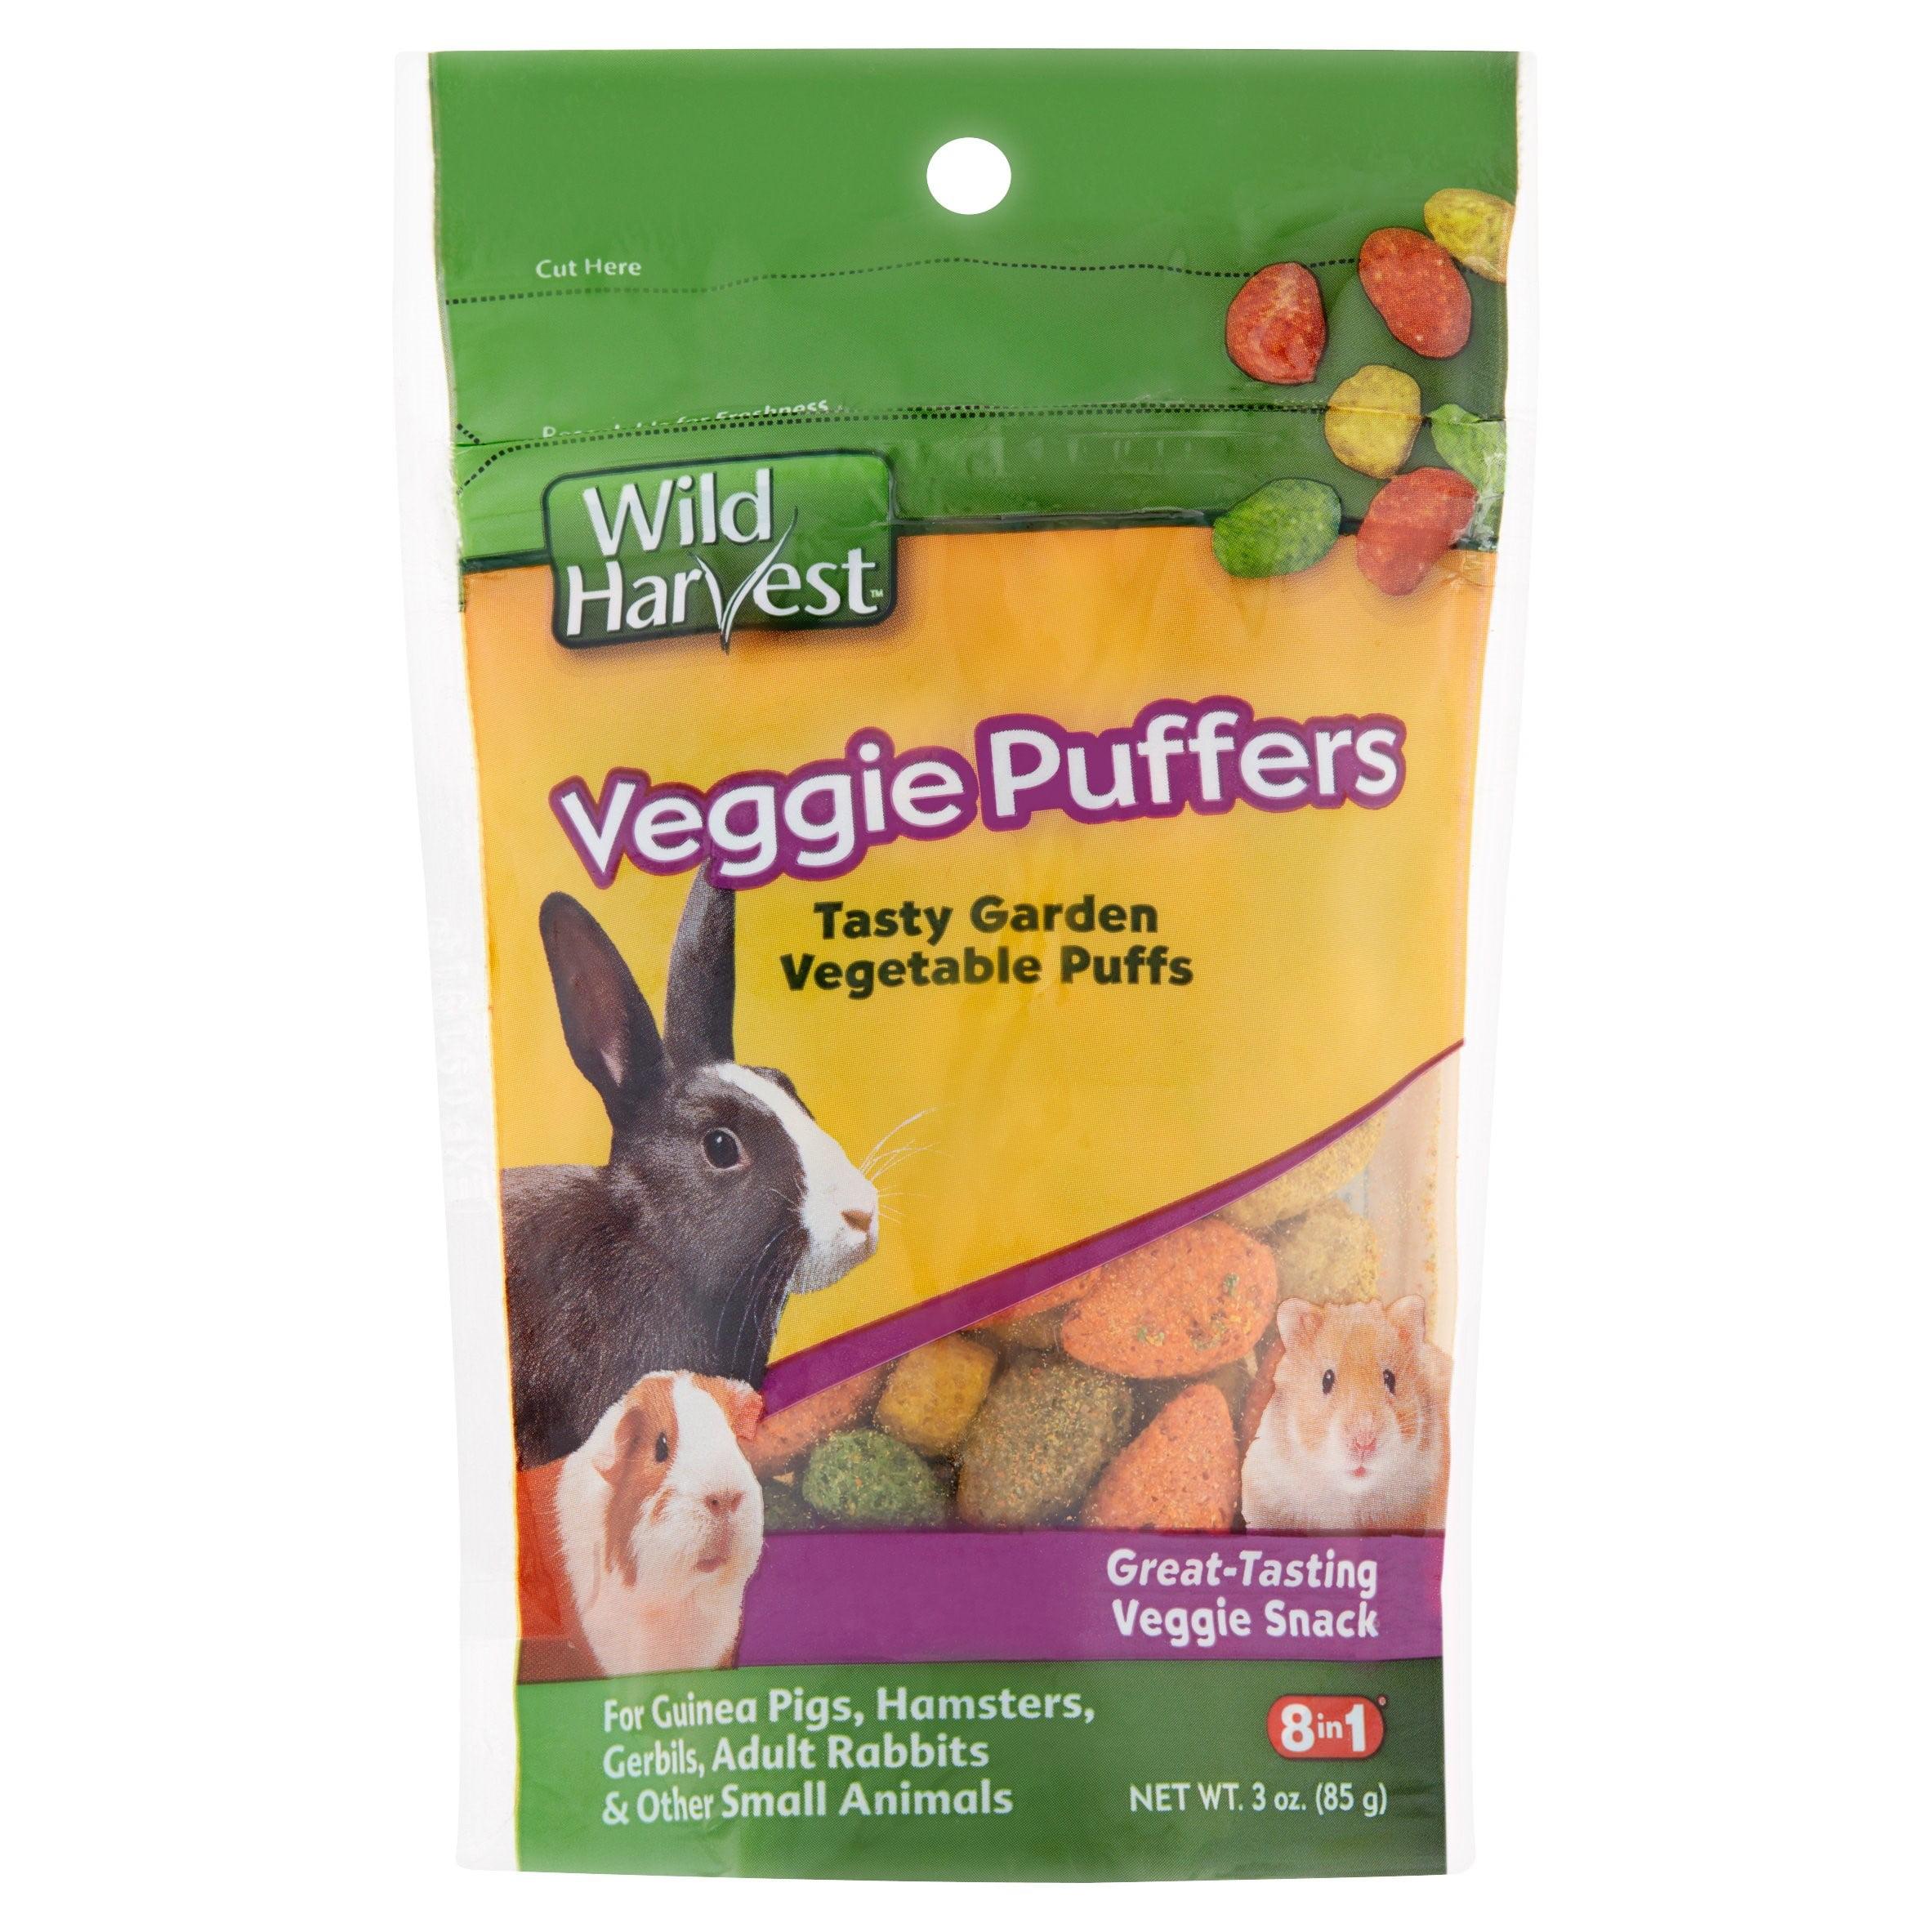 Wild Harvest Veggie Puffers for Small Animals, 3 oz - Walmart.com